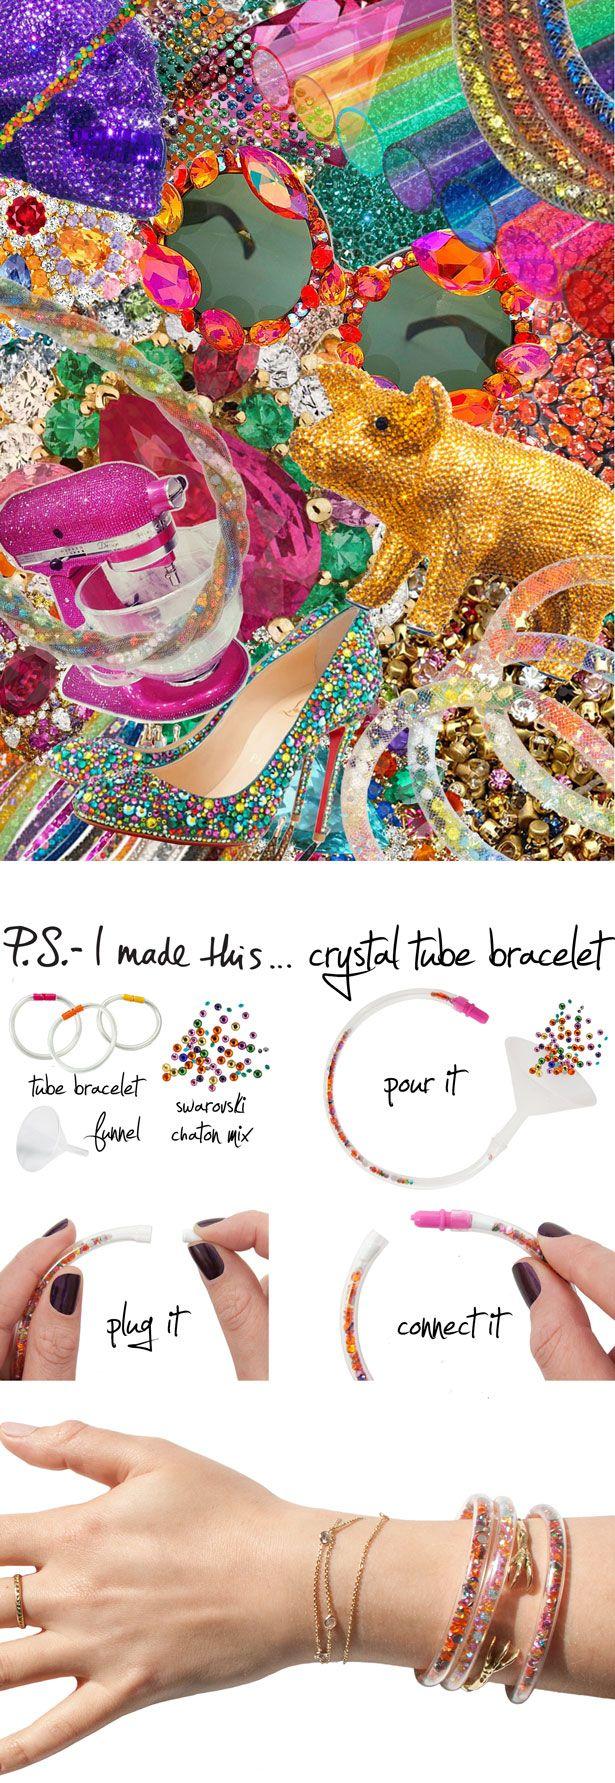 P.S.-I made this..Crystal Tube Bracelet #PSIMADETHIS #DIY #INSPIRATION #COLLAGE